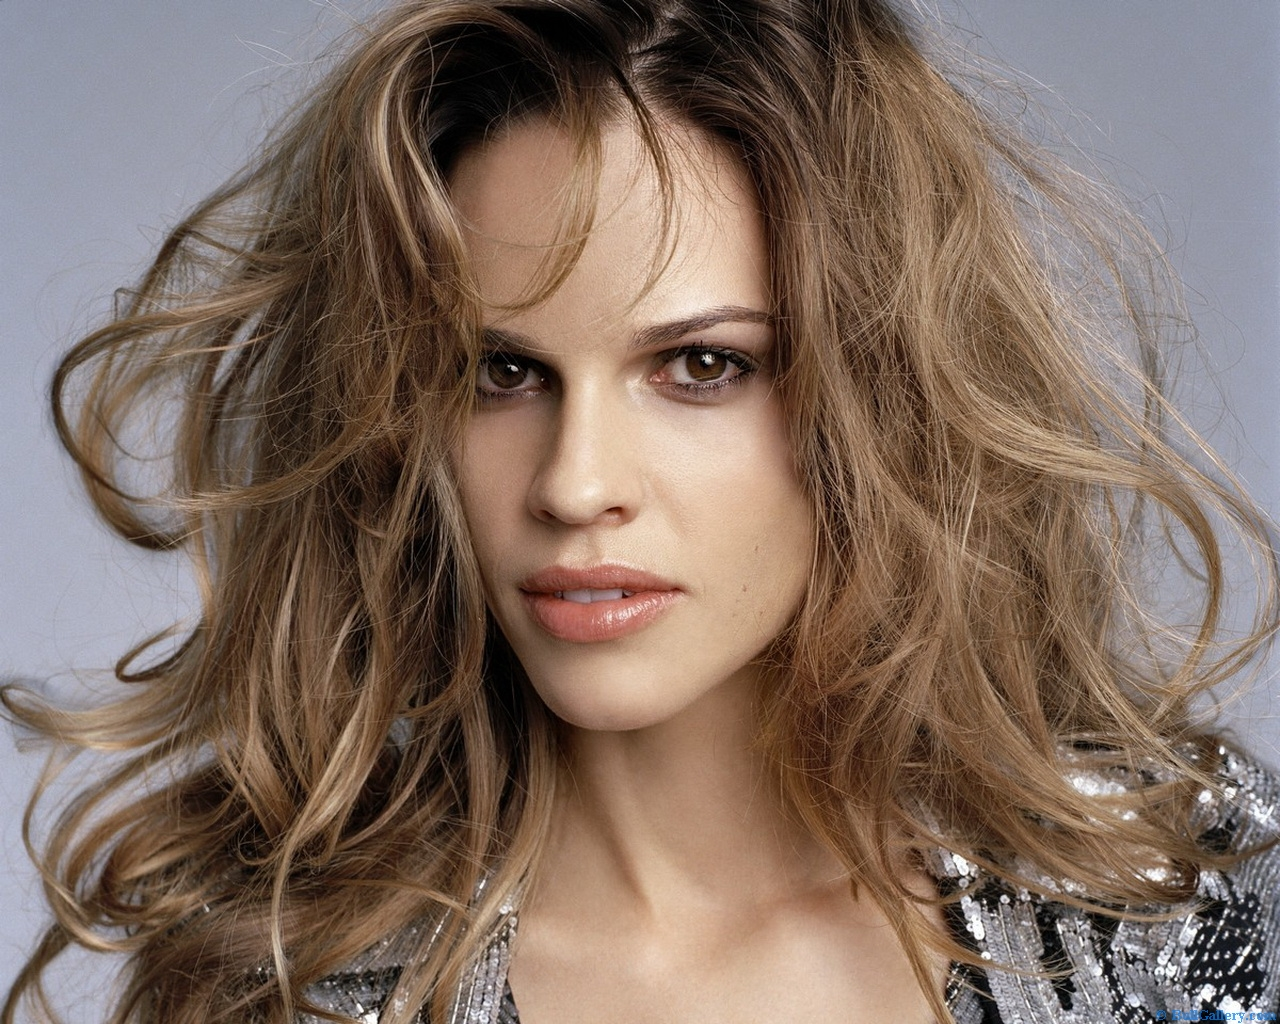 http://3.bp.blogspot.com/-1ho3M5kBKu8/UFtHoFOvckI/AAAAAAAAEhQ/JA3hJwYowh8/s1600/Hilary-Swank-Hairstyle.jpg